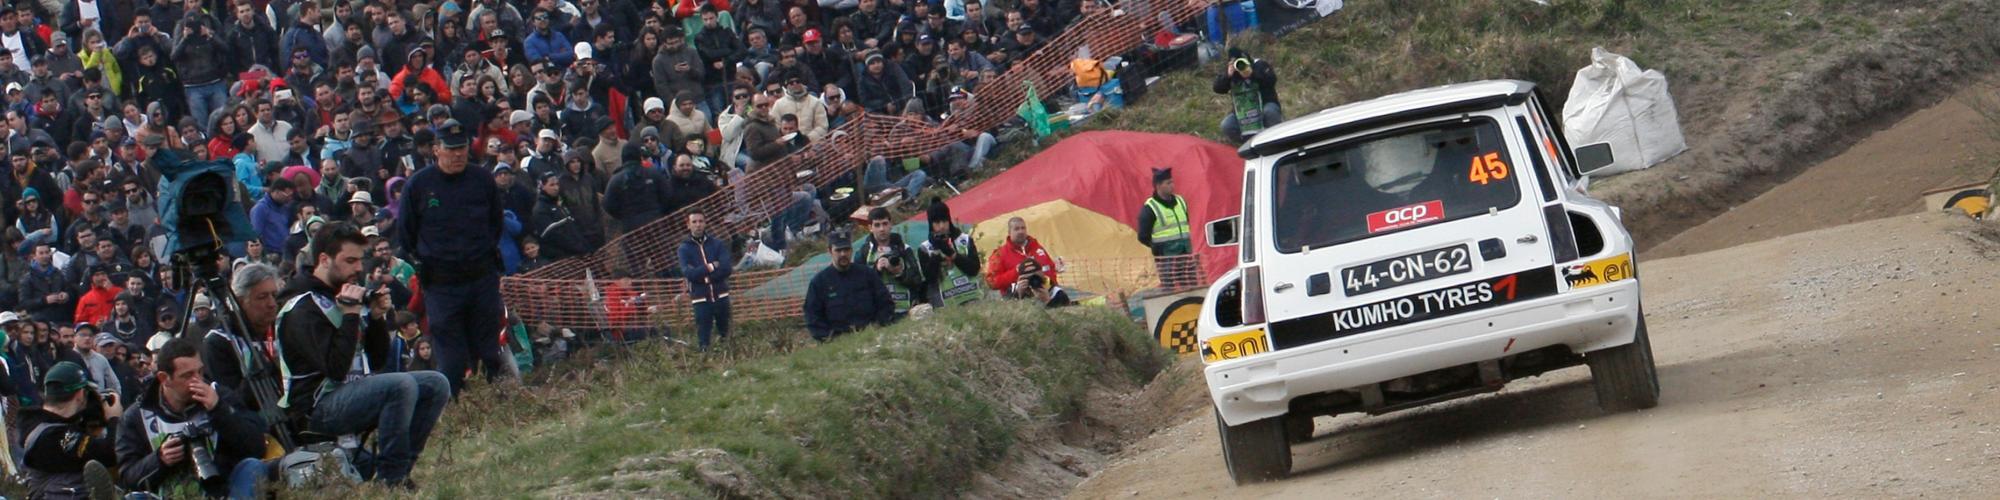 Melliard Motorsport cover image